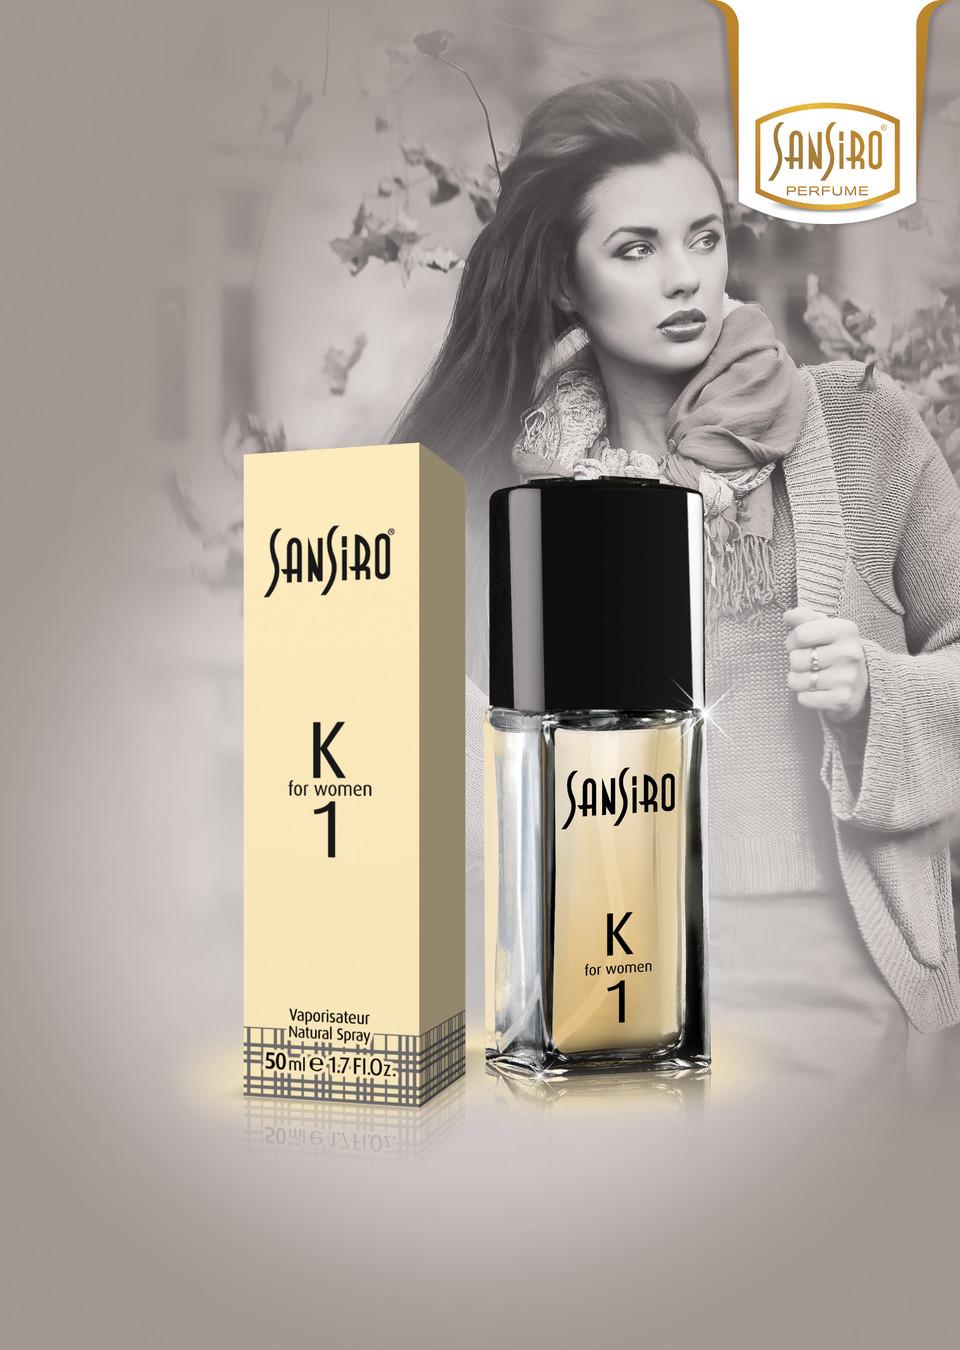 Sansiro Perfume - For Women - Berry Woman (K1)